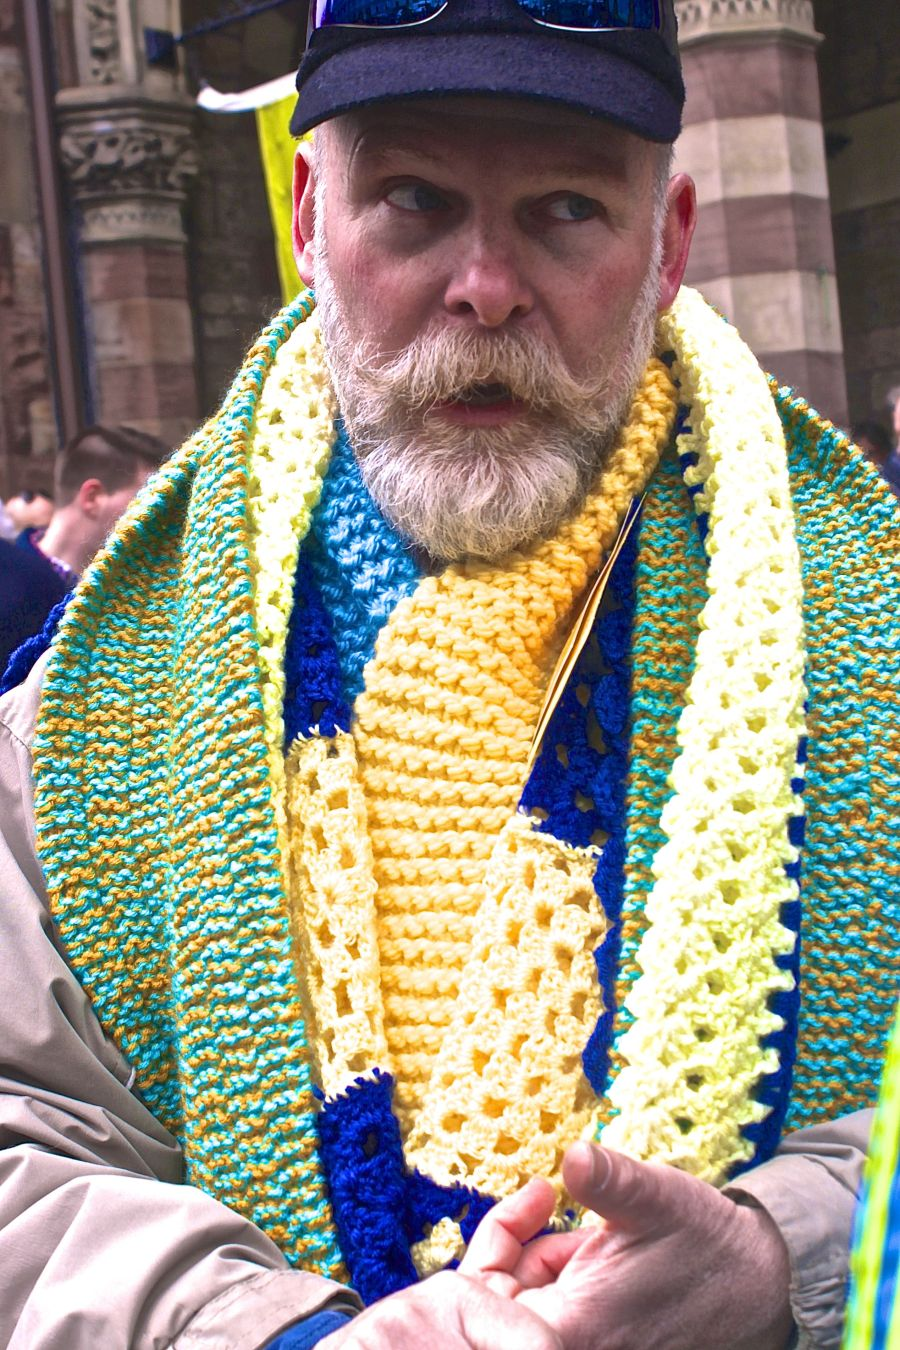 boston old south church marathon scarf distribution 1